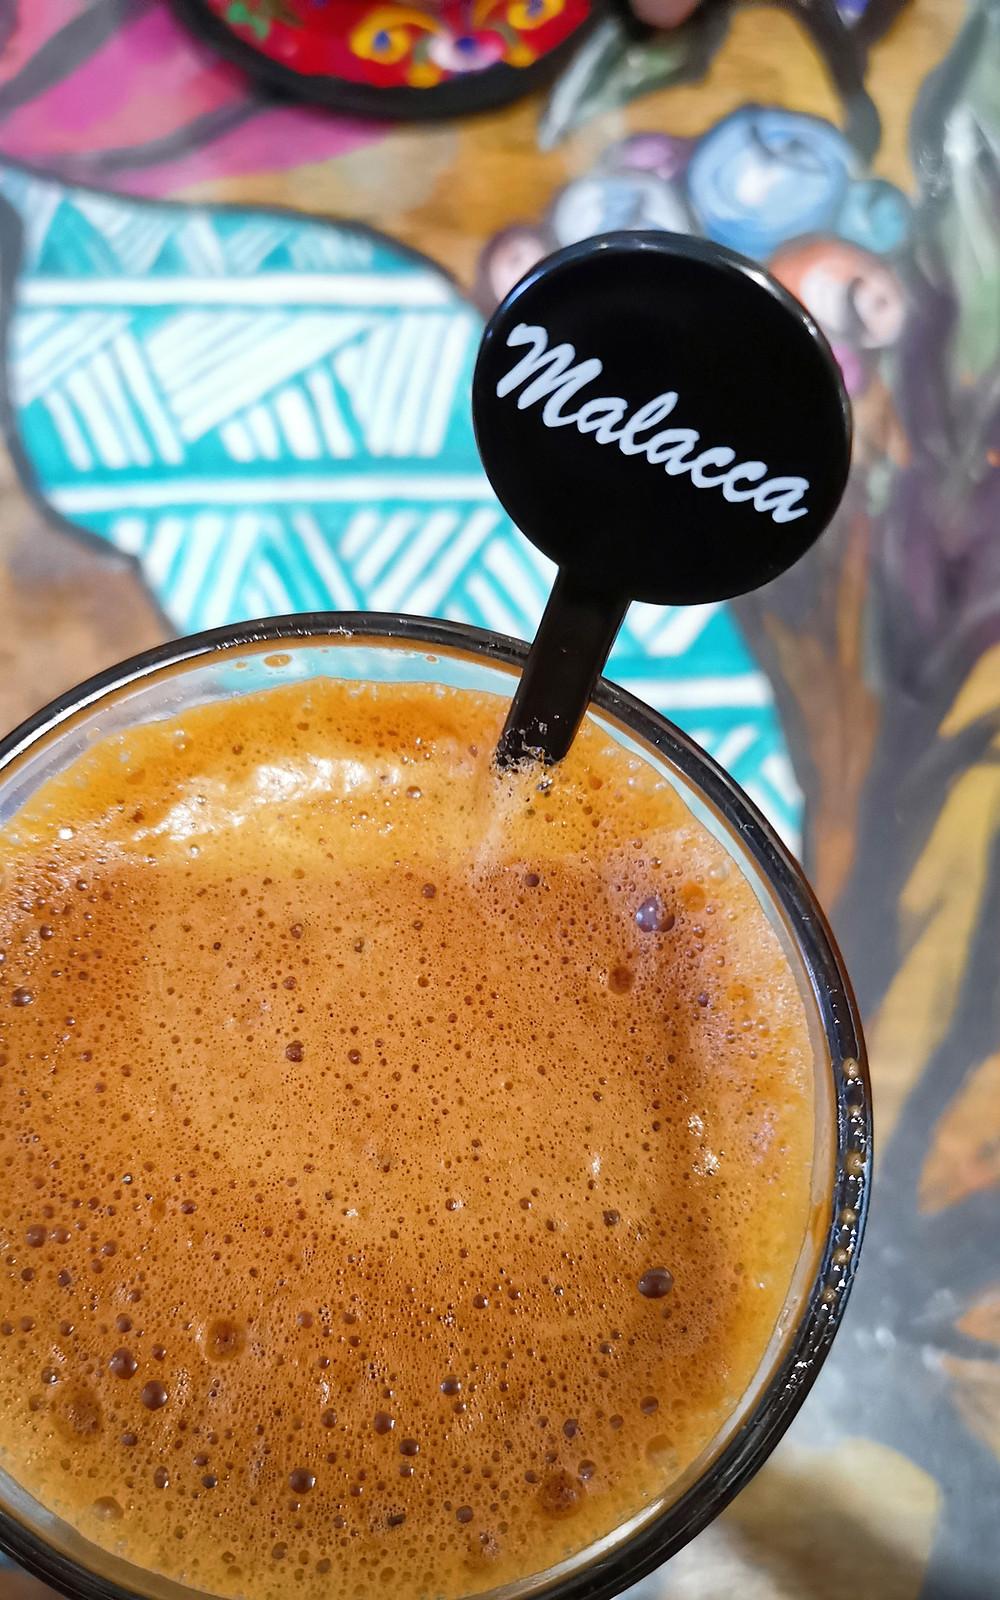 Melaka Malacca coffee